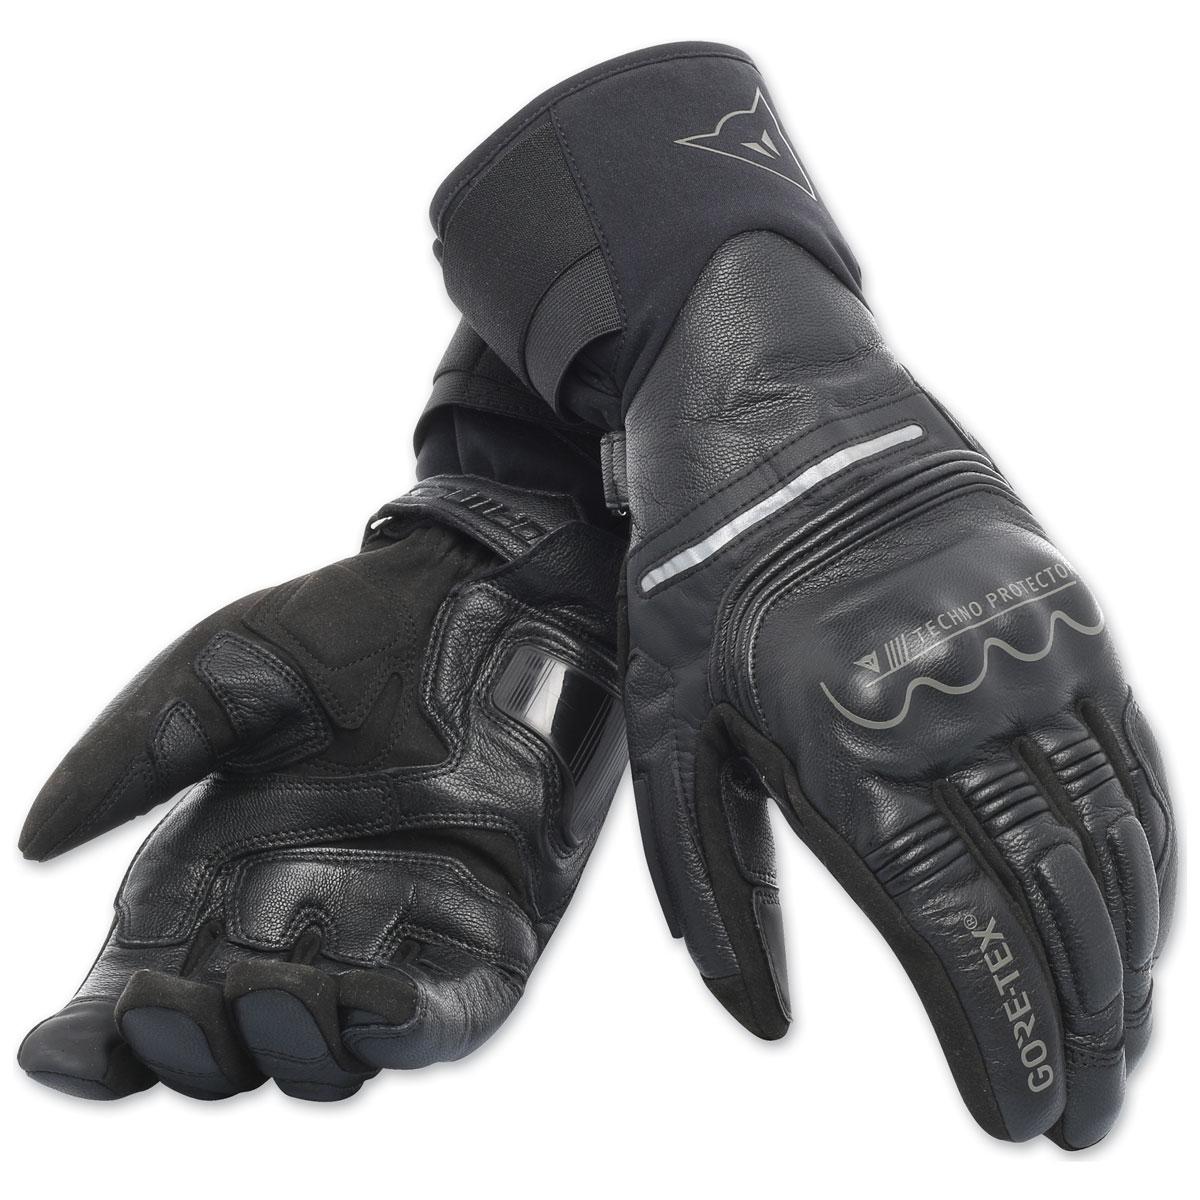 Dainese Men's Universe Gore-Tex Black Gloves